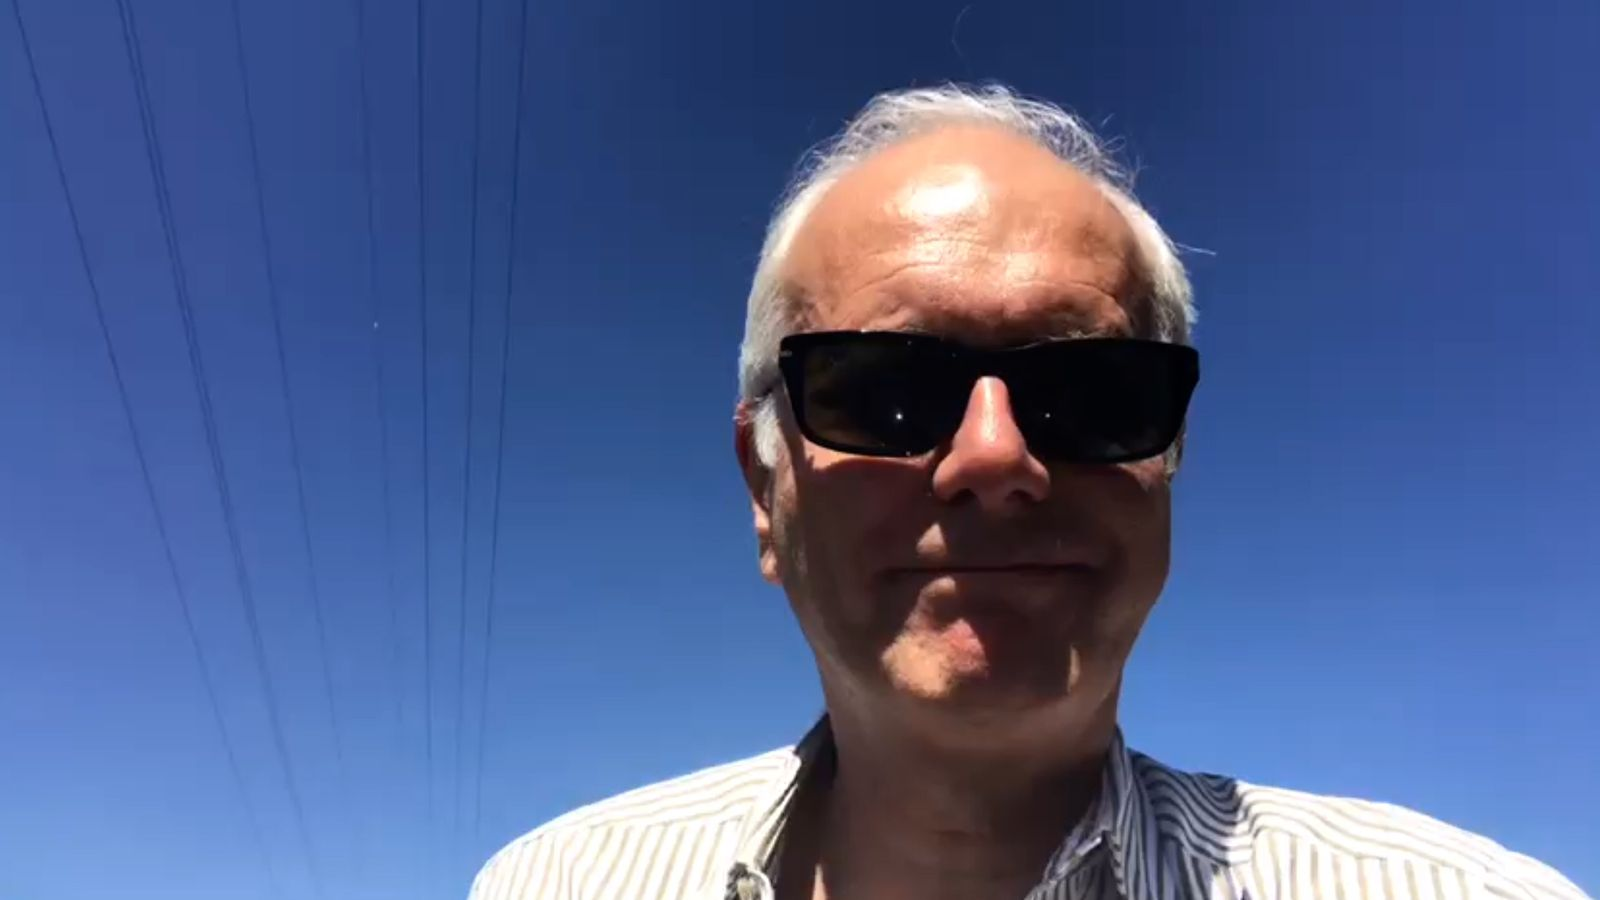 Video.00_00_00_00.Standbild001-16